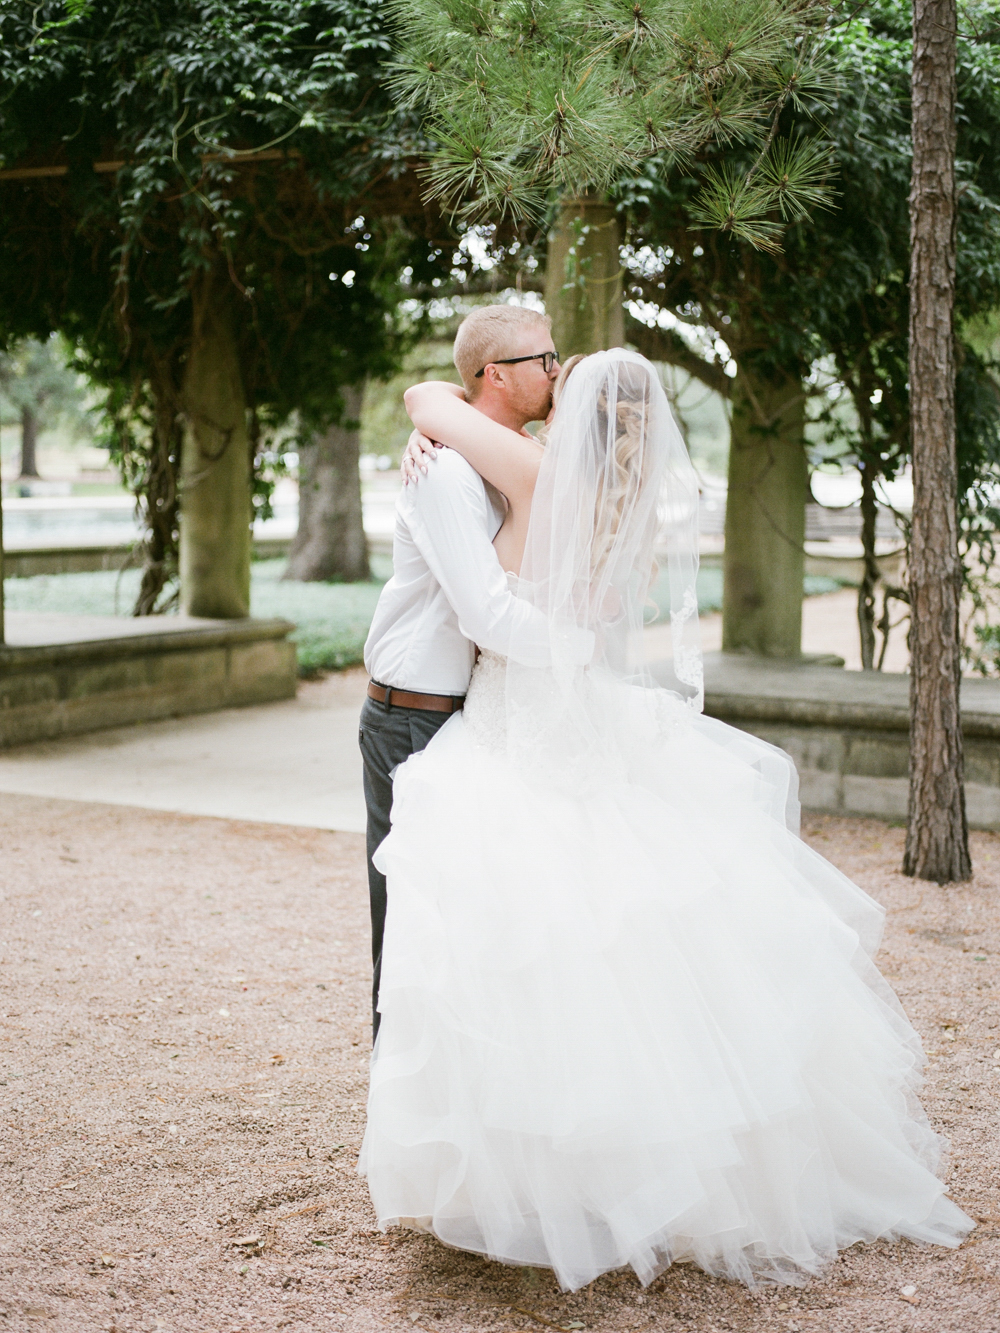 benefits of a first look_wedding photography_wedding photographer_film wedding photographer_Christine Gosch_www.christinegosch.com_Houston, Texas wedding photographer_ Houston, Texas-13.jpg